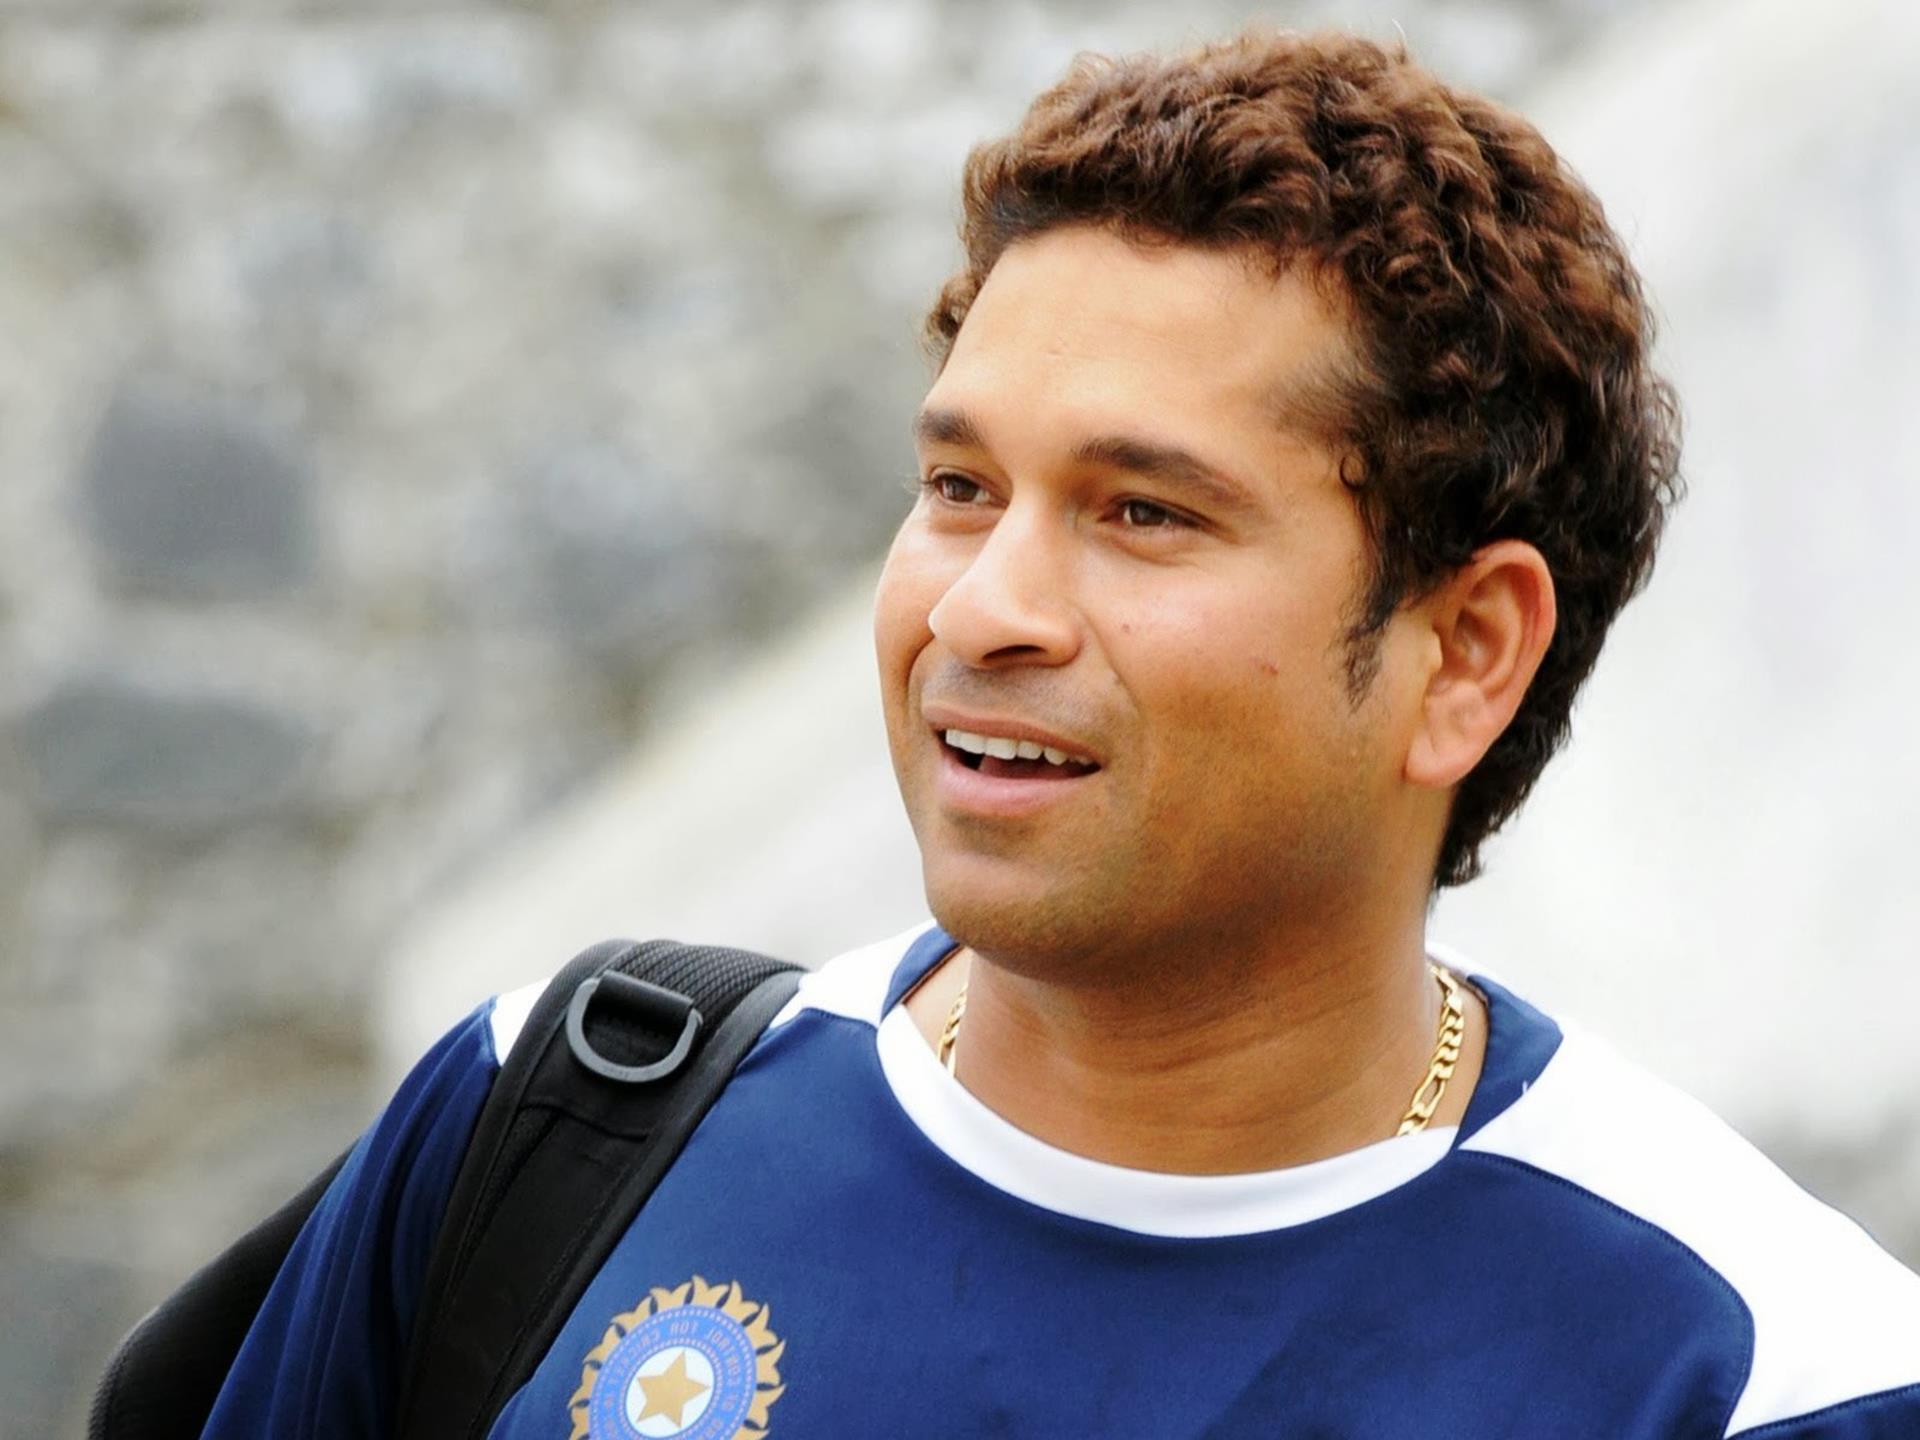 information of sachin tendulkar in hindi Sachin tendulkar's career : hello sachin sir ji appko cricket se alag dhekhker cricket dhekna bekaar hai kyo ki app he indian cricket ki jaan the.